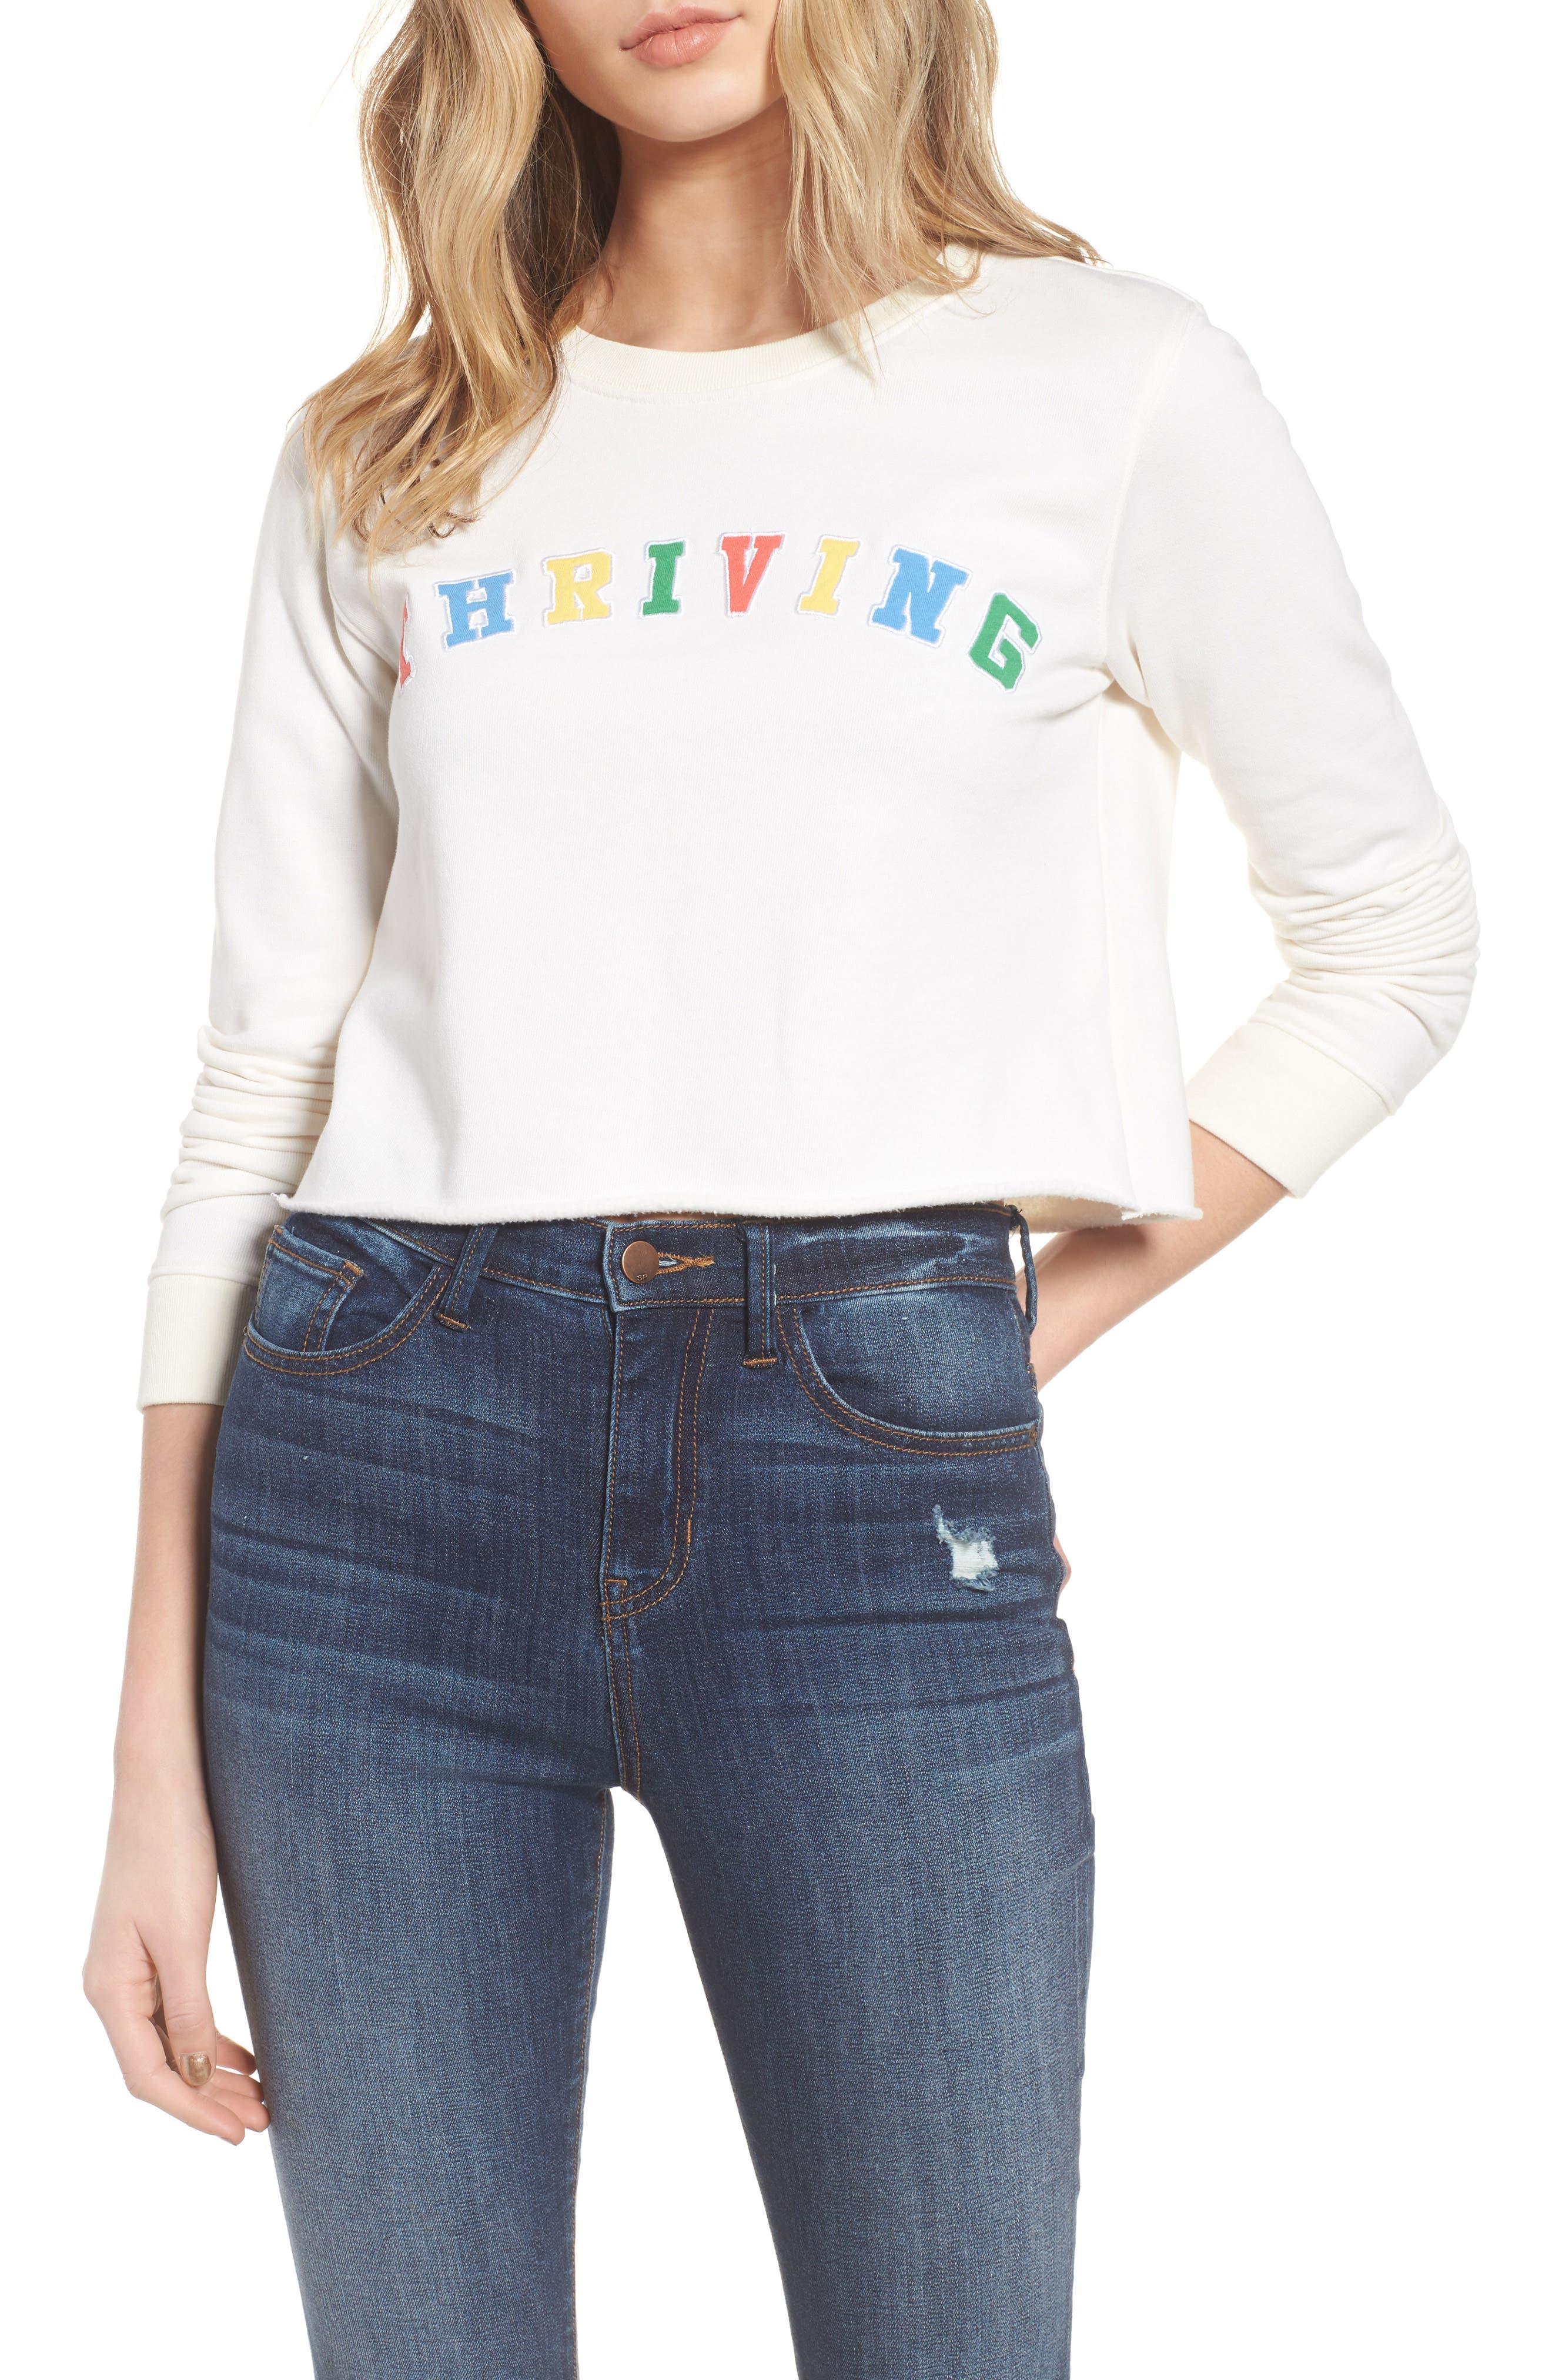 Main Image - Desert Dreamer Thriving Crop Sweatshirt